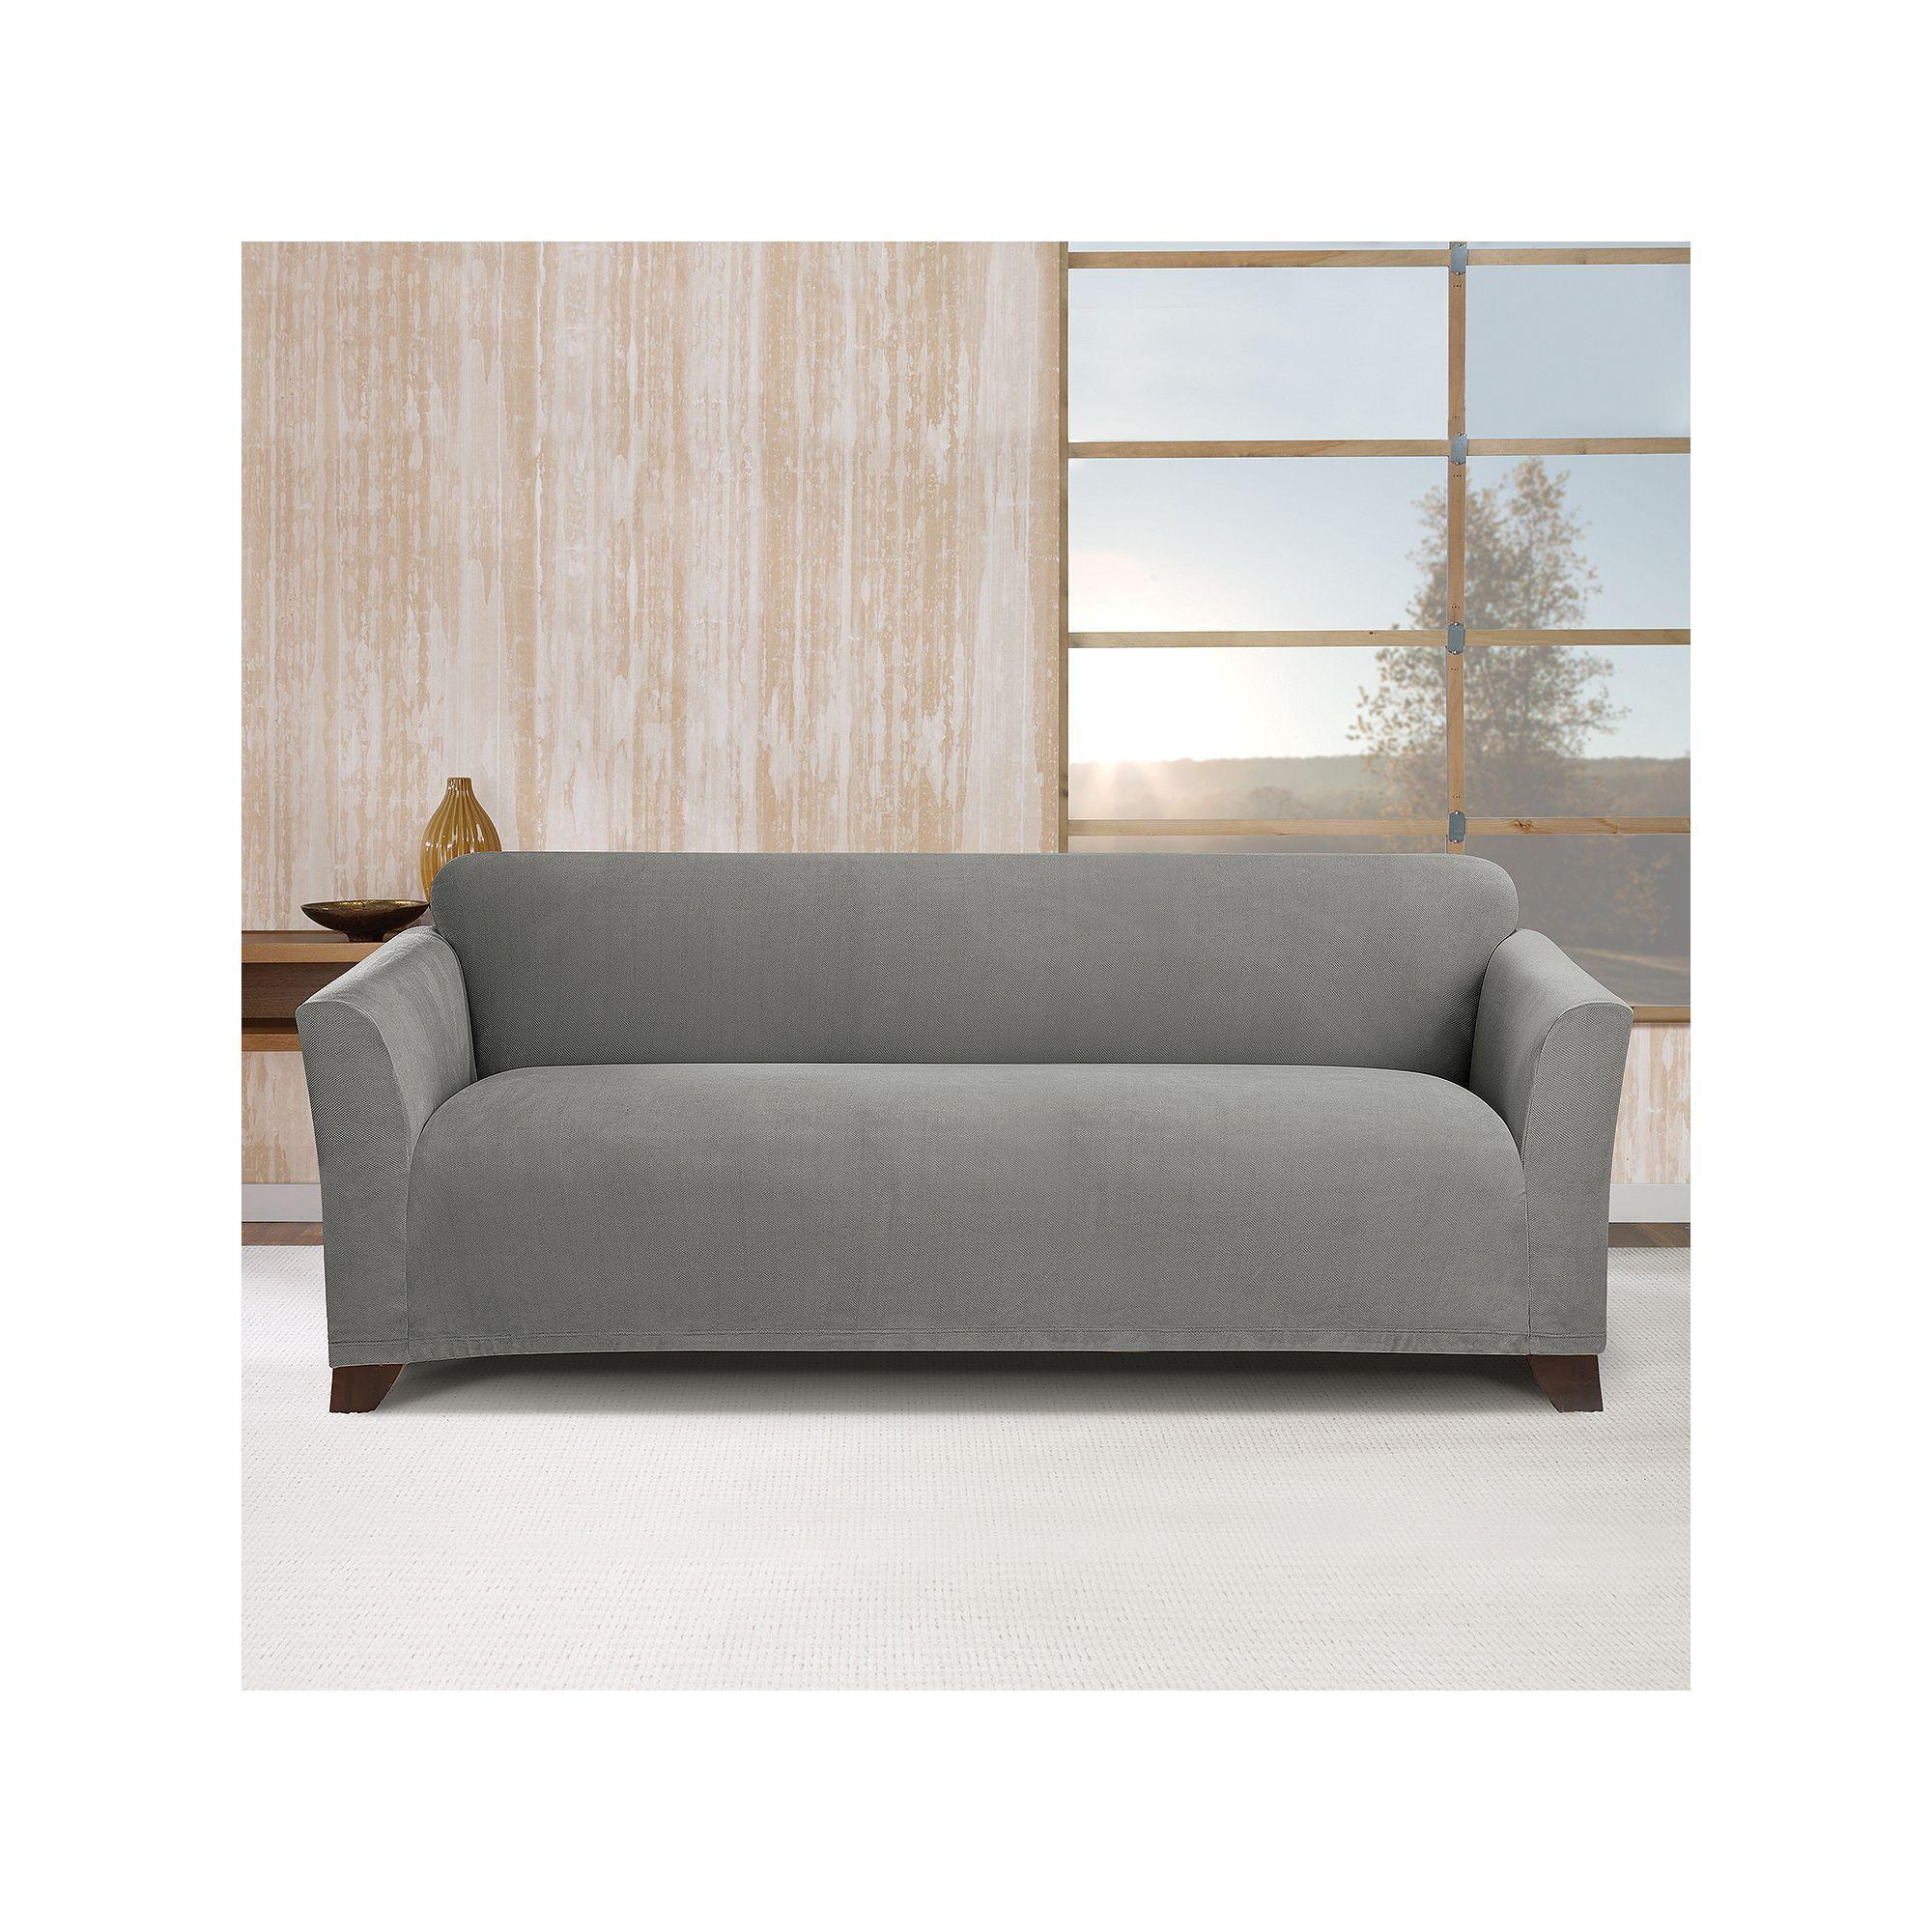 Sure Fit Stretch Morgan Sofa Slipcover | Cushions on sofa ...